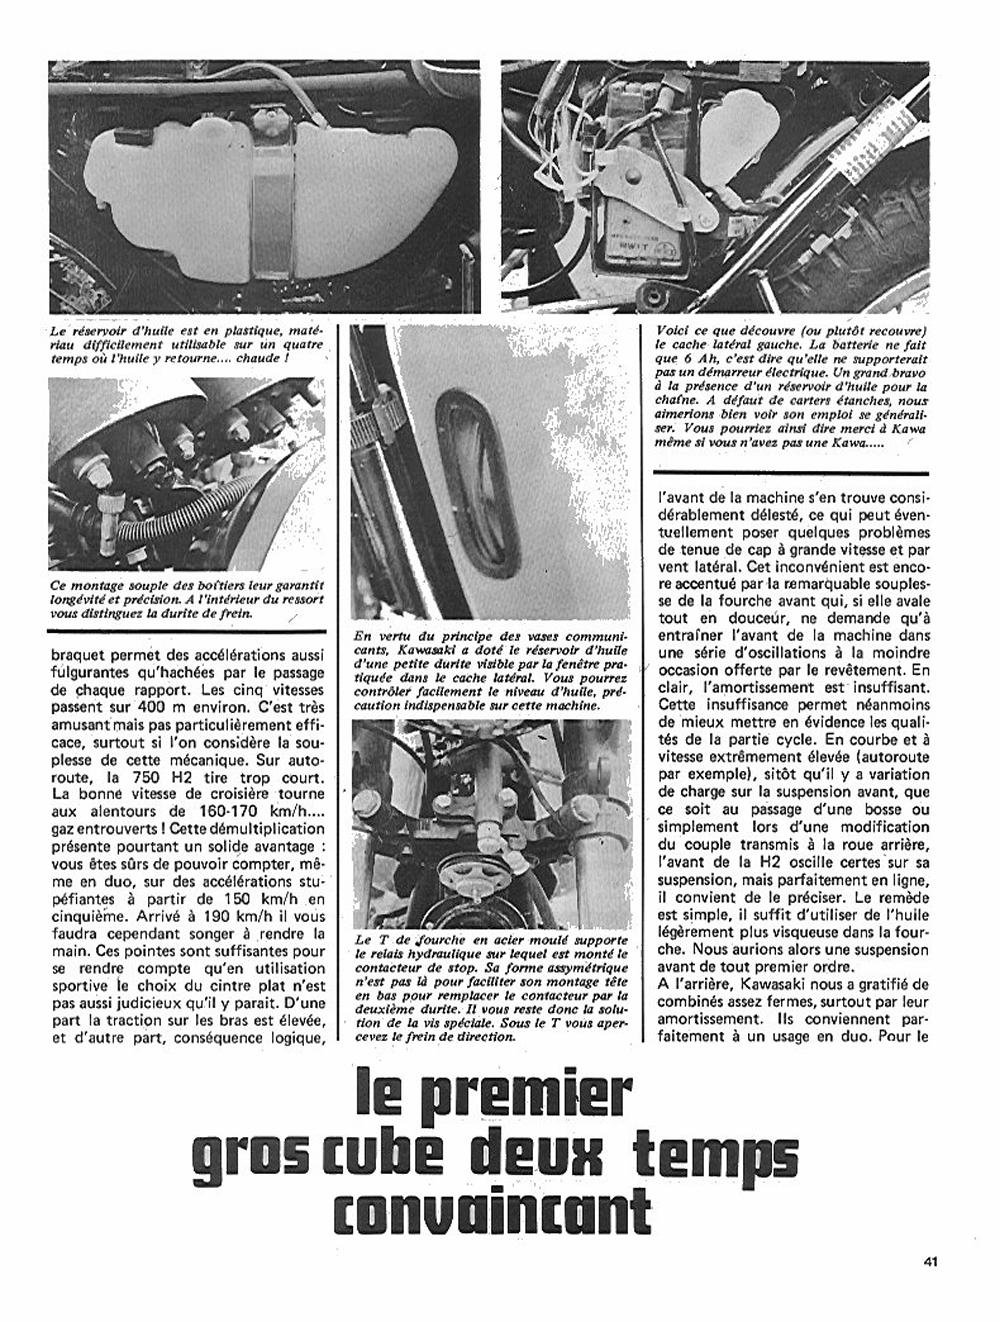 1972 Kawasaki H2 750 road test france 06.jpg